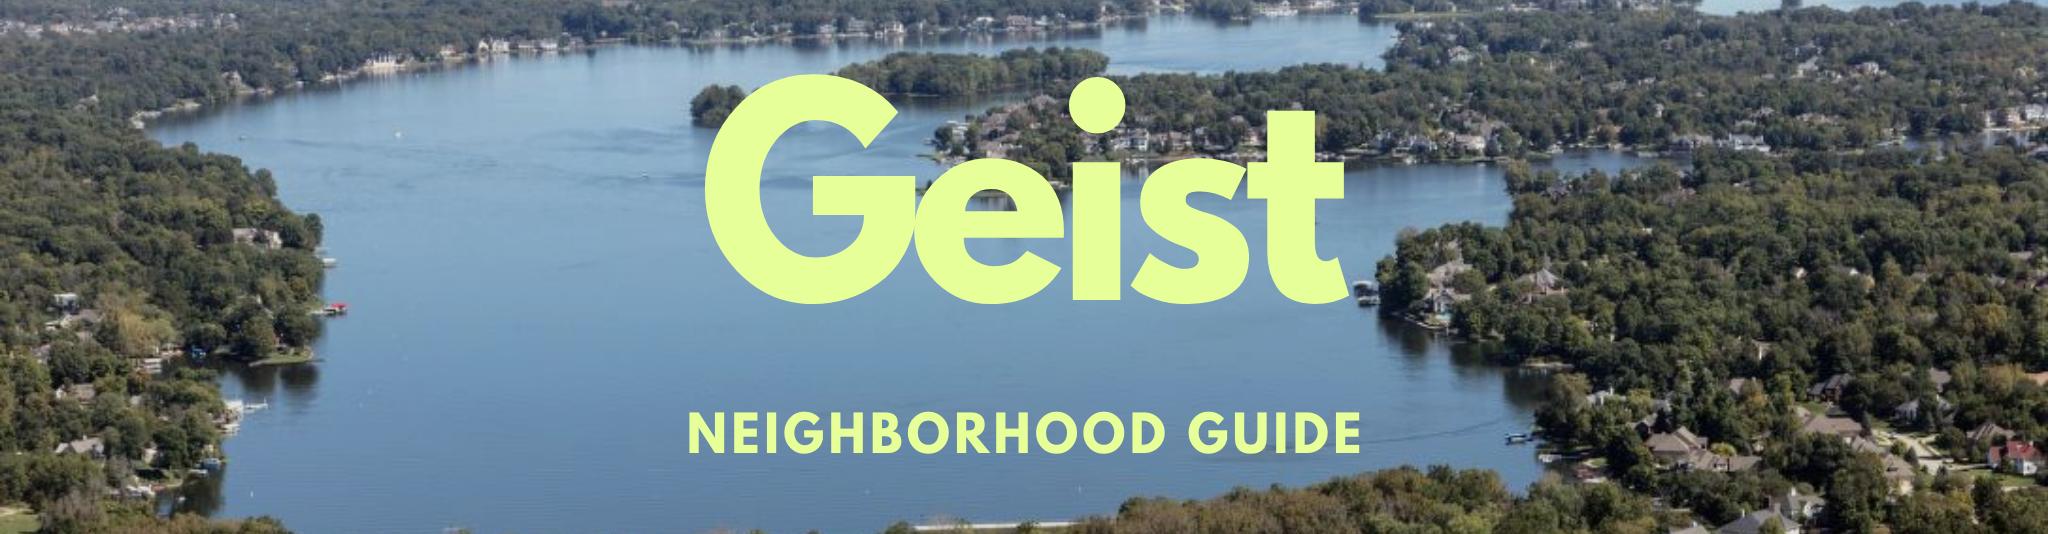 Geist Indiana Real Estate Neighborhood Guide